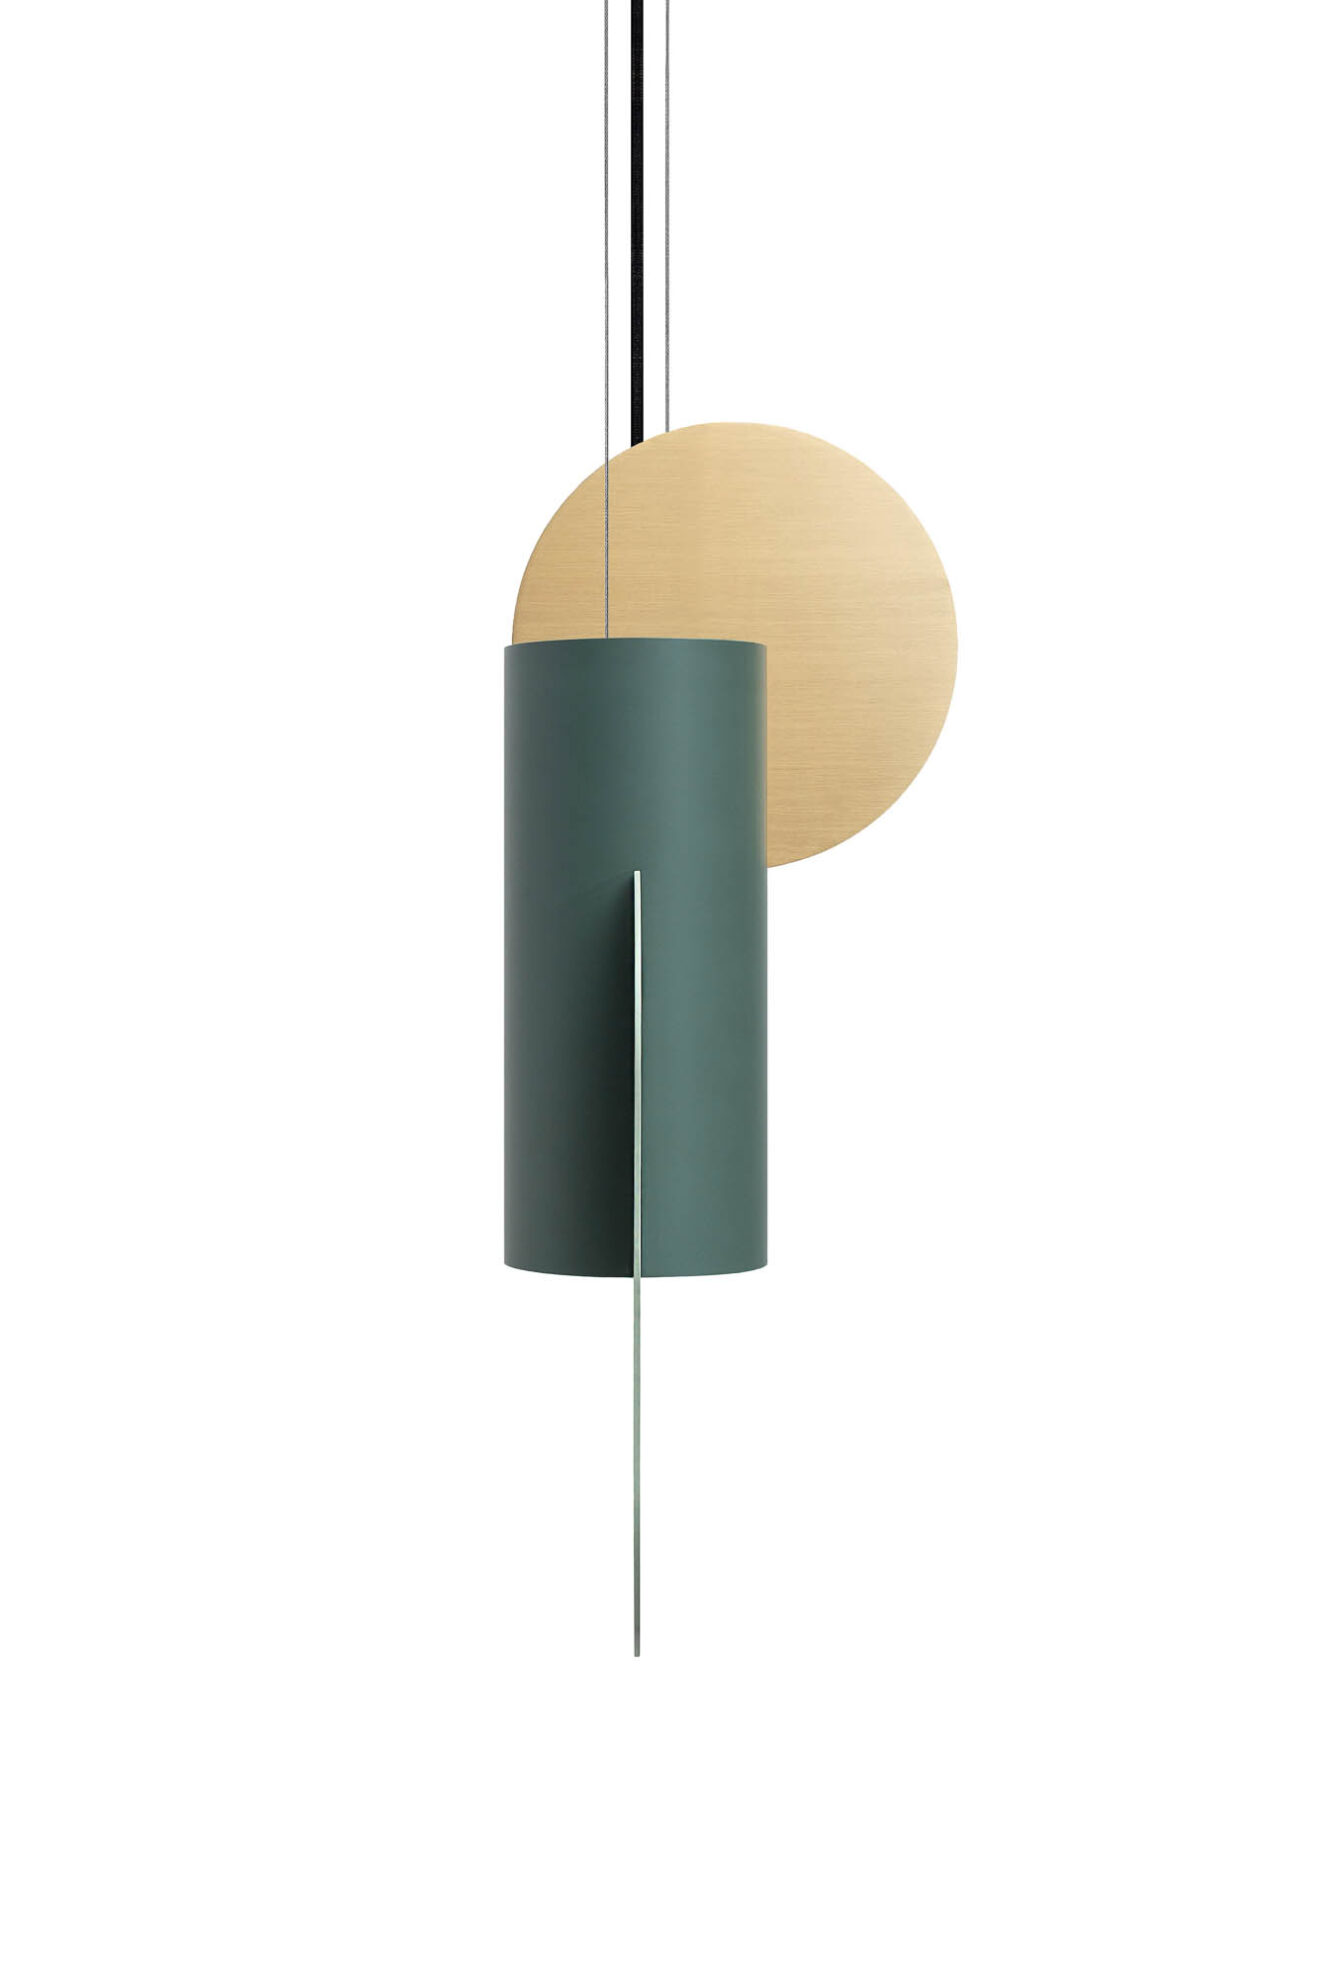 Noom-Suprematic-Lamp-CS5-12